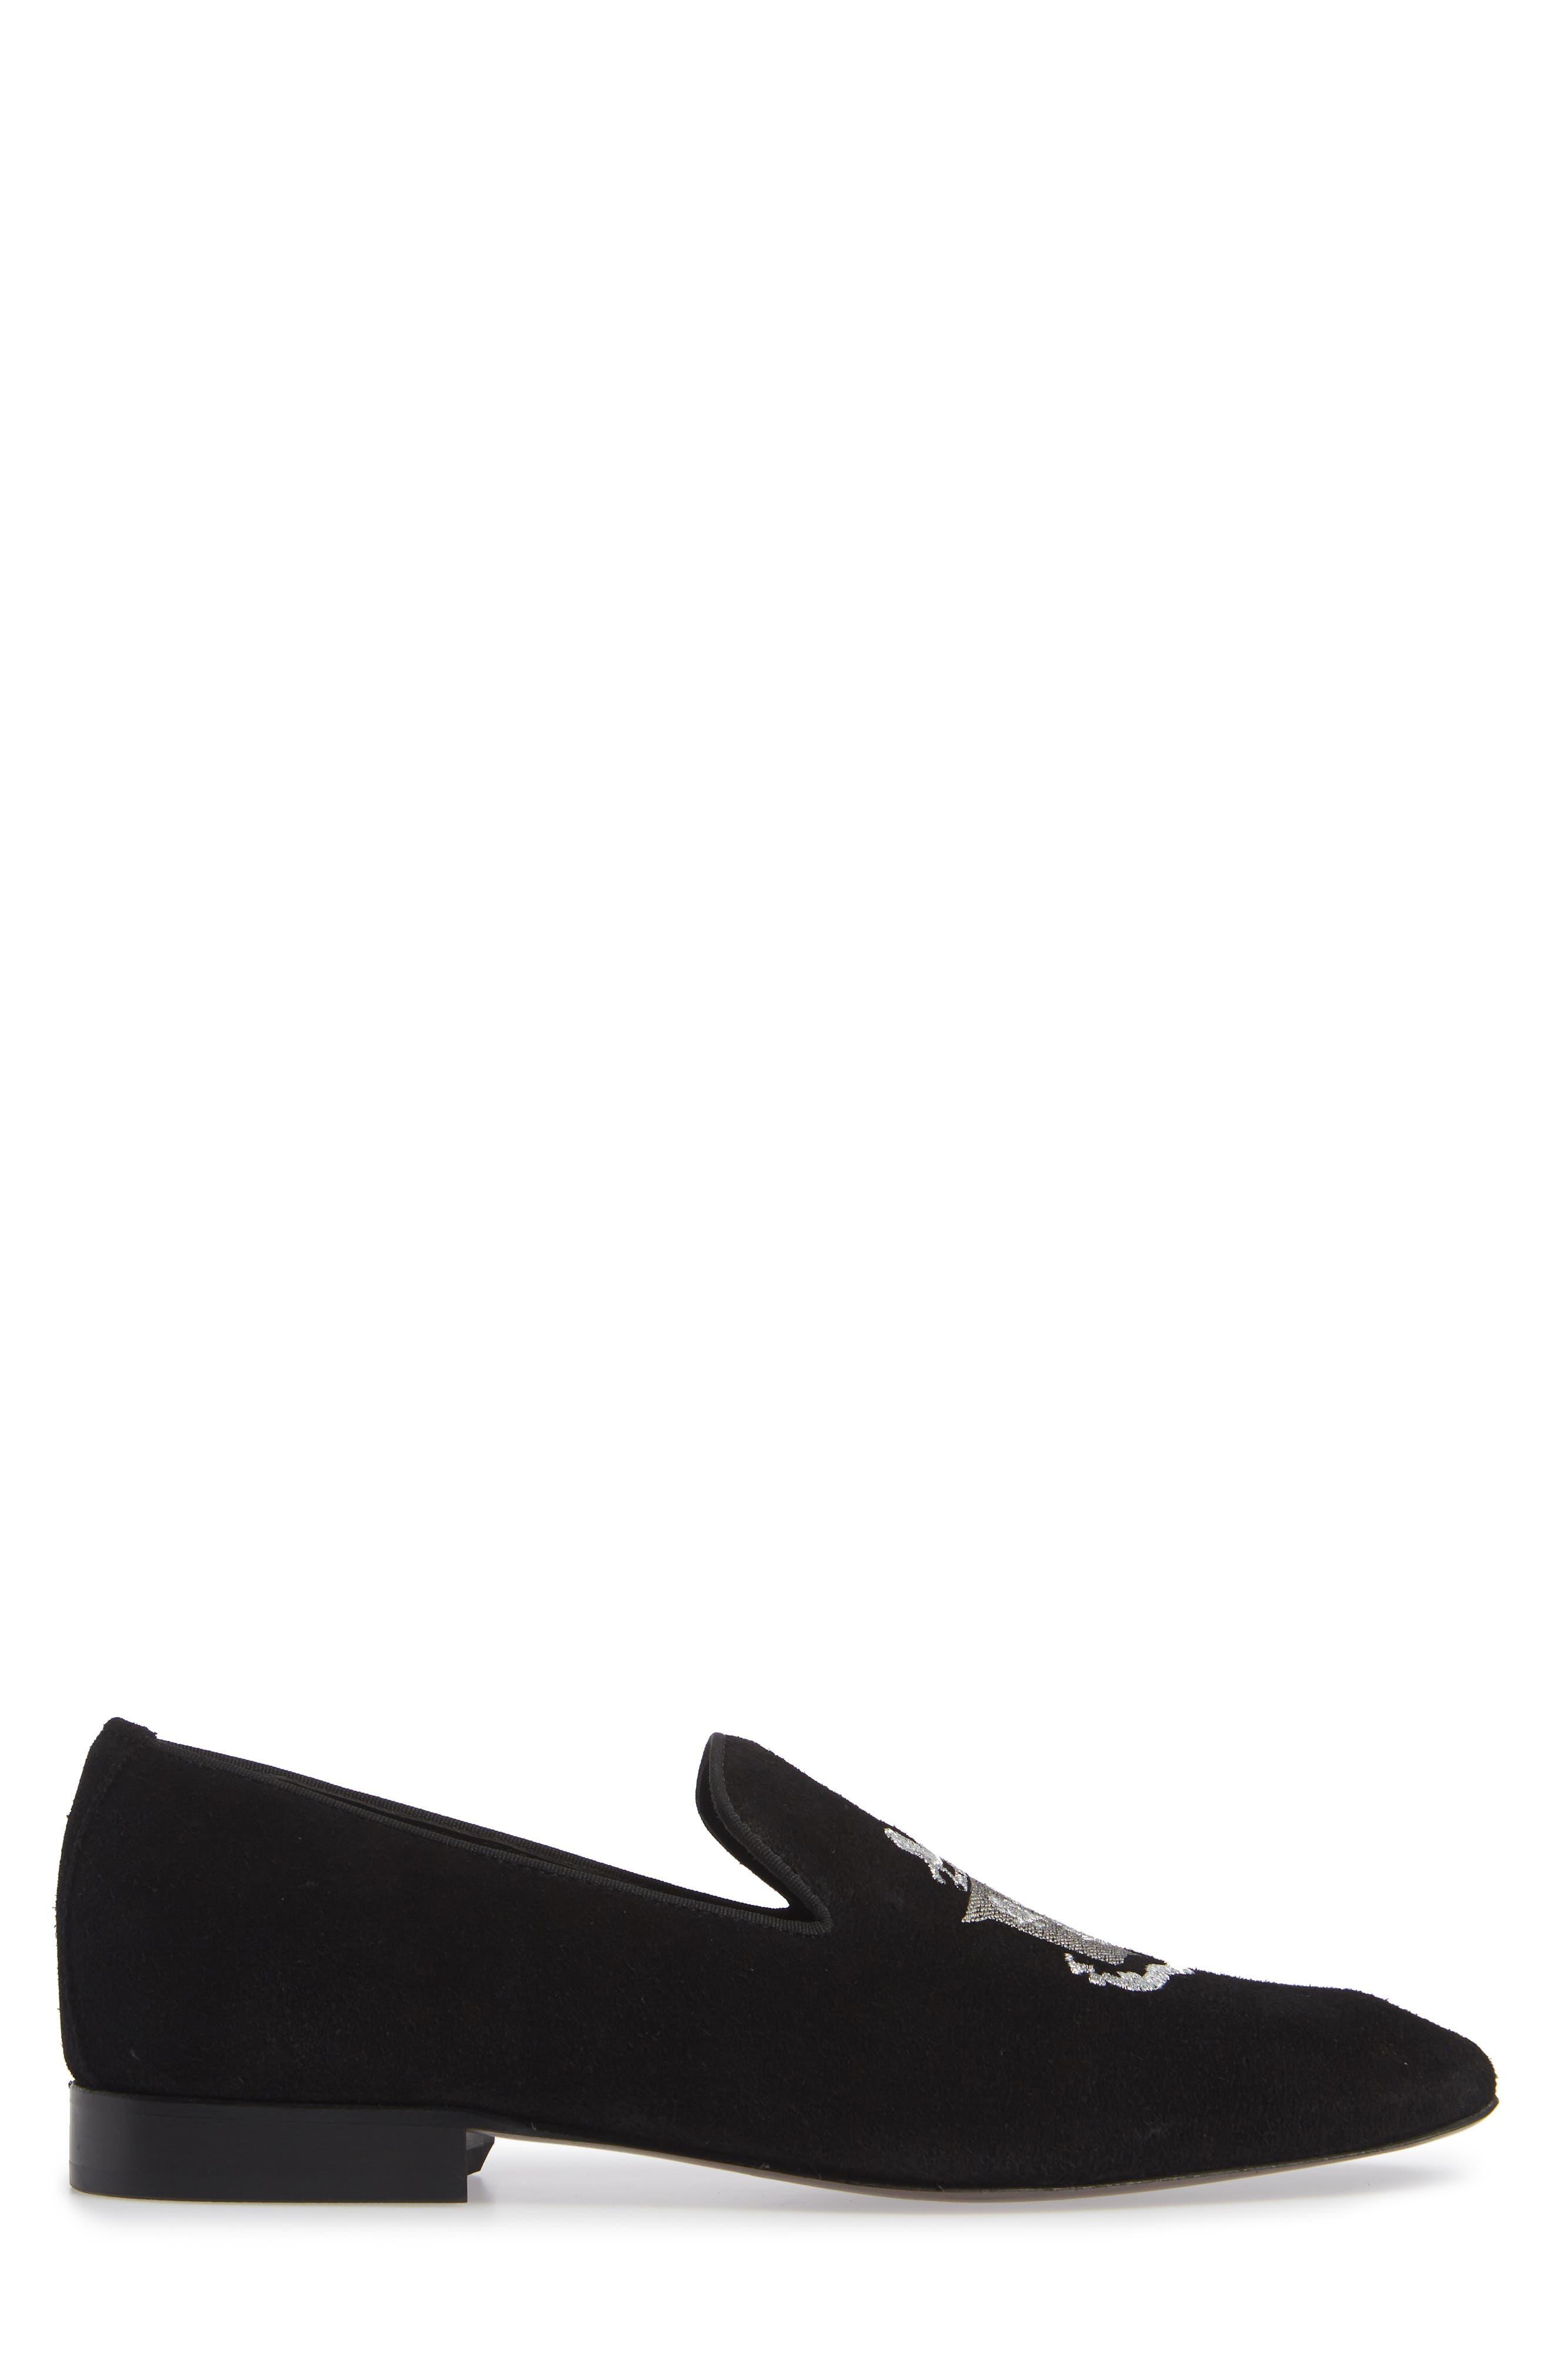 Altos Embroidered Venetian Loafer,                             Alternate thumbnail 3, color,                             BLACK SUEDE